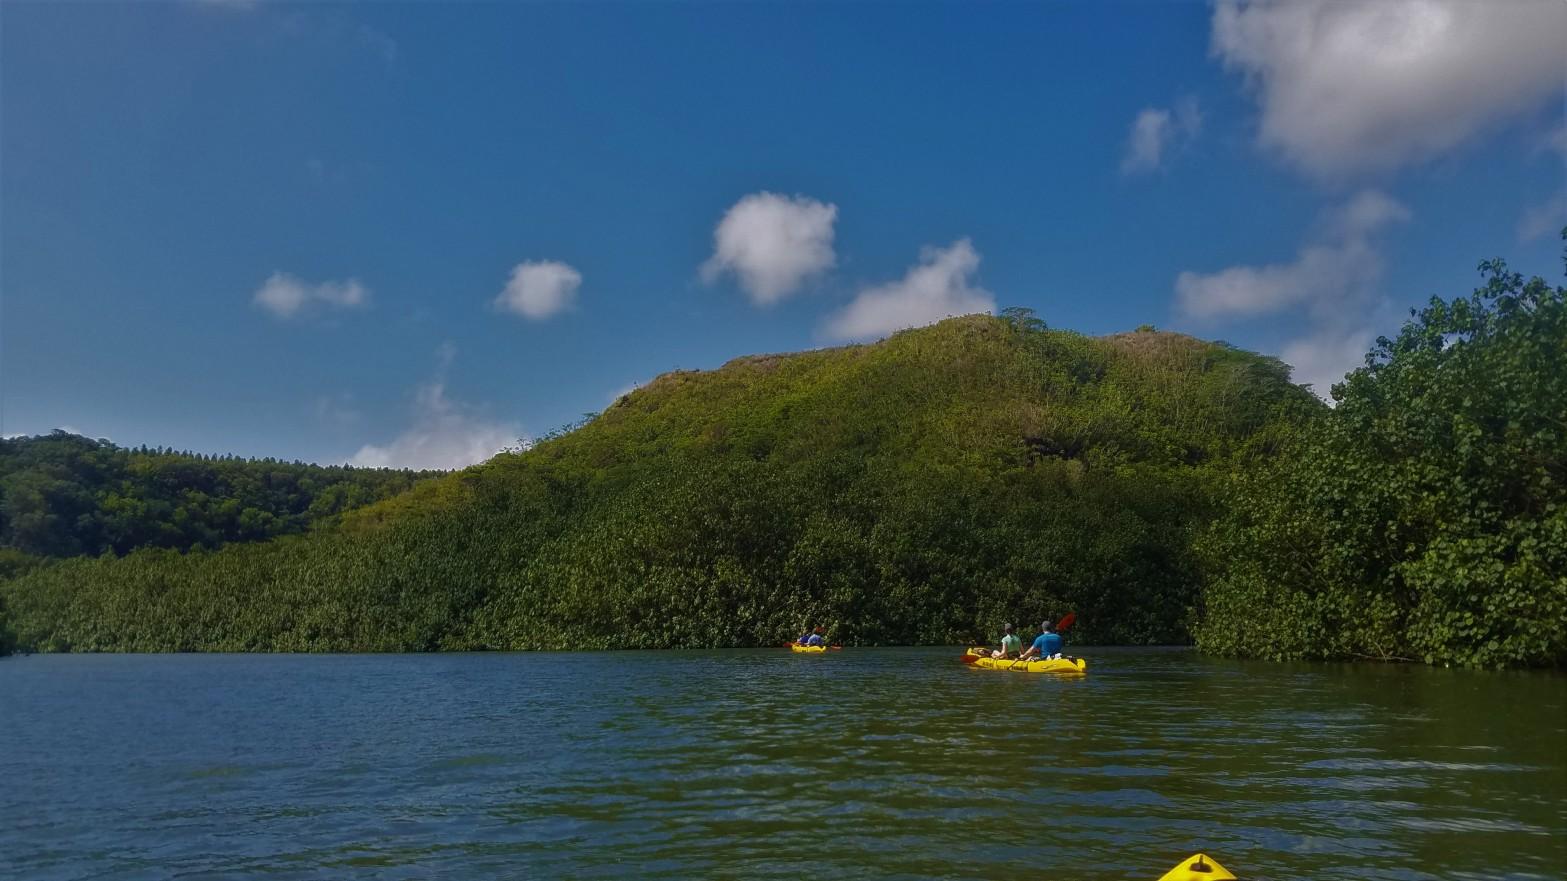 Kauai, Hawaii Travel Guide | Kayak & Hike Along the Wailua River